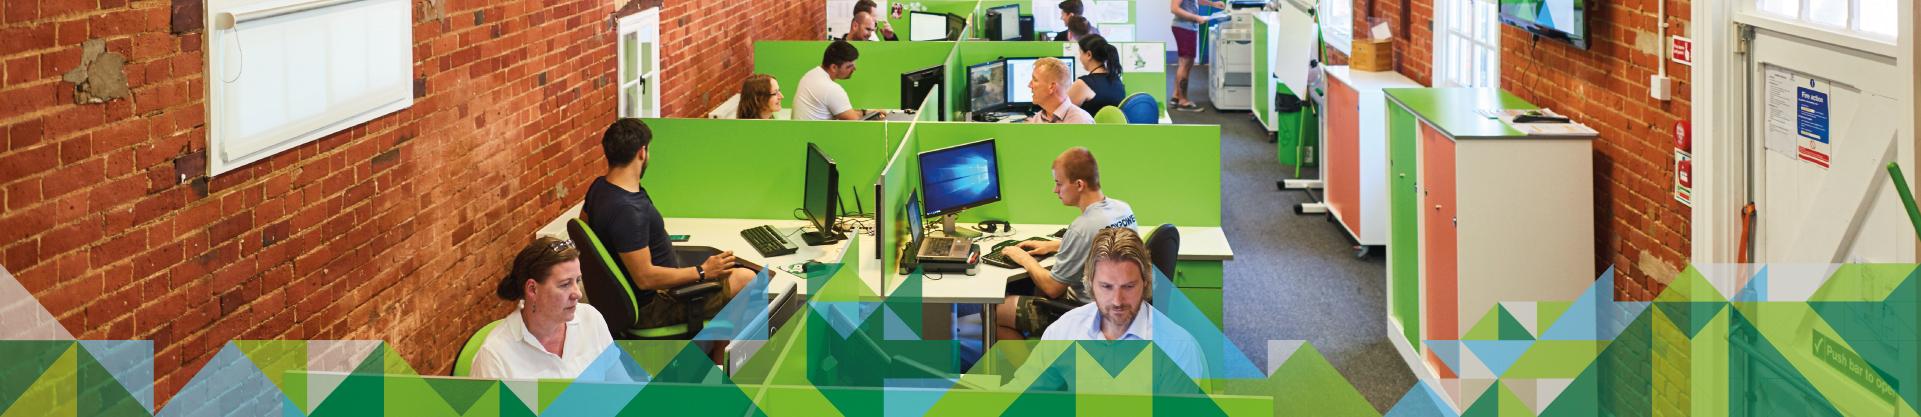 CATSURVEYS Head Office with staff